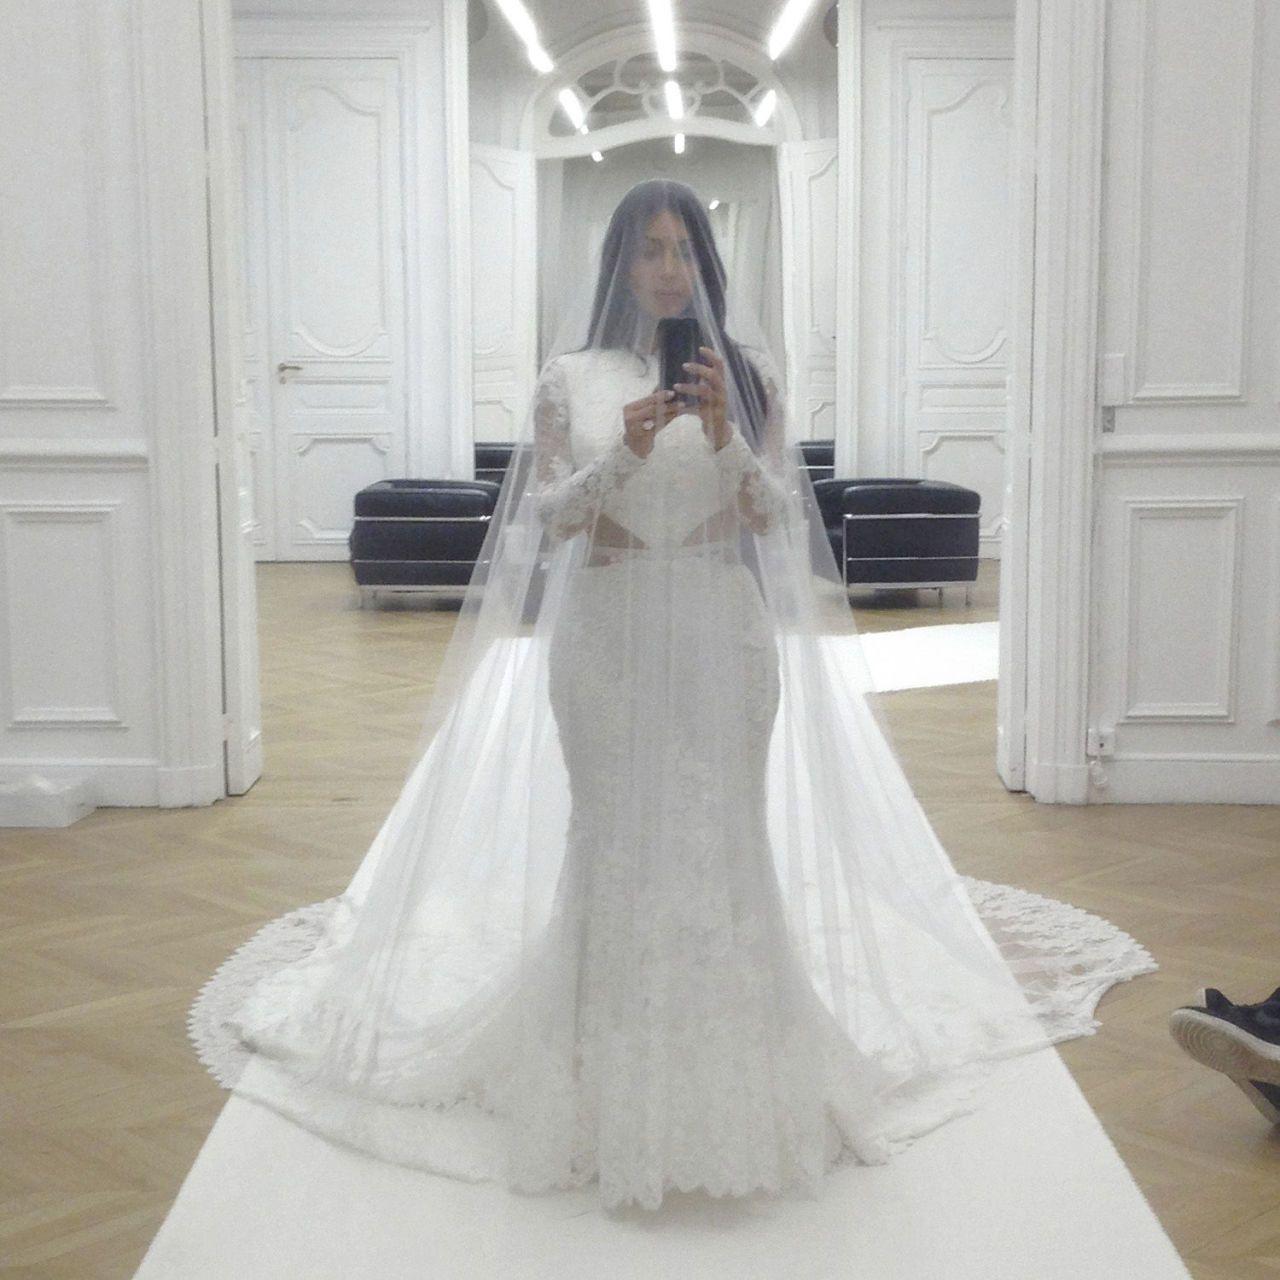 Book of Life Wedding Dress